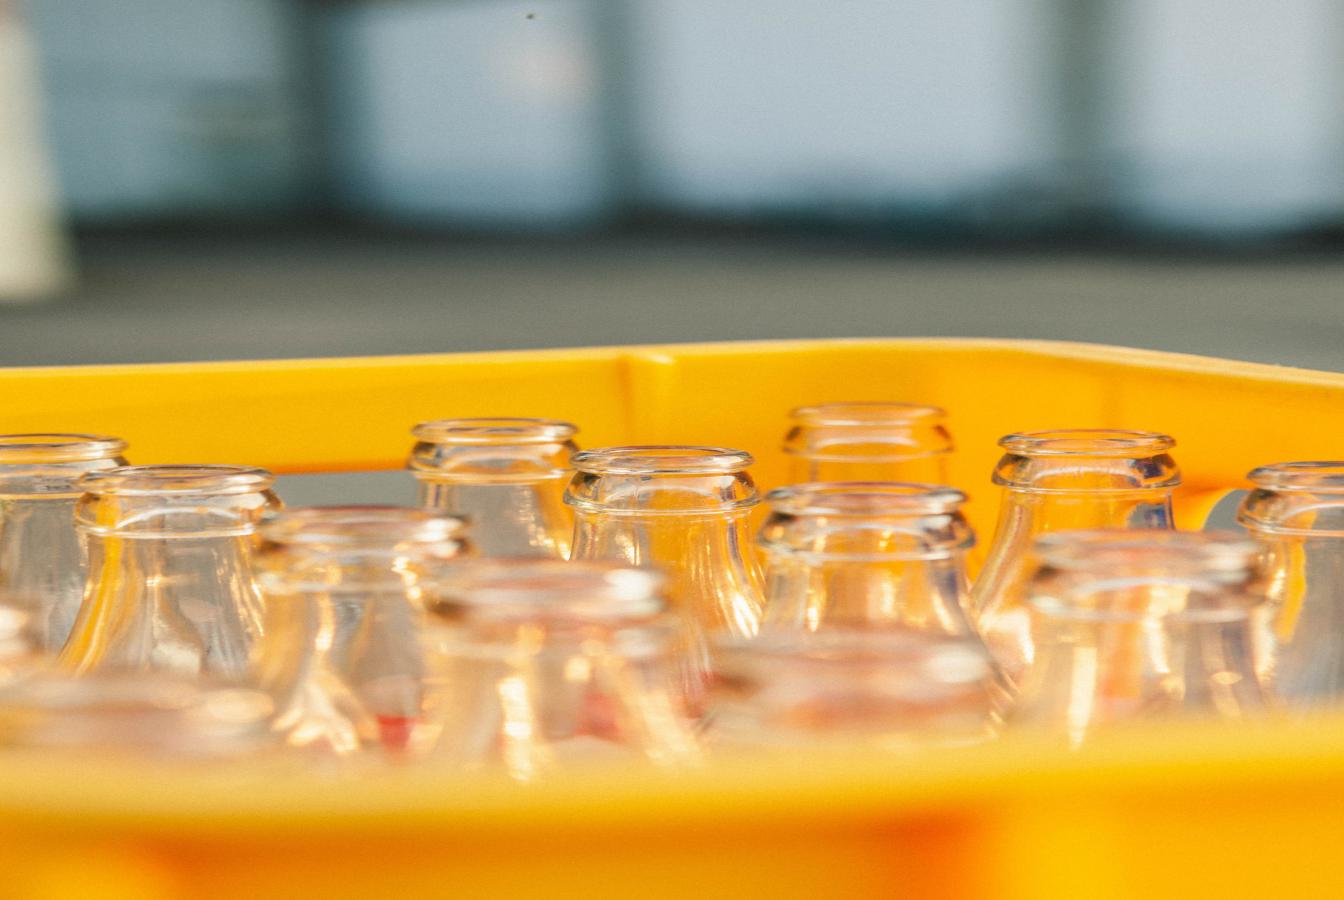 Crate of glass milk bottles